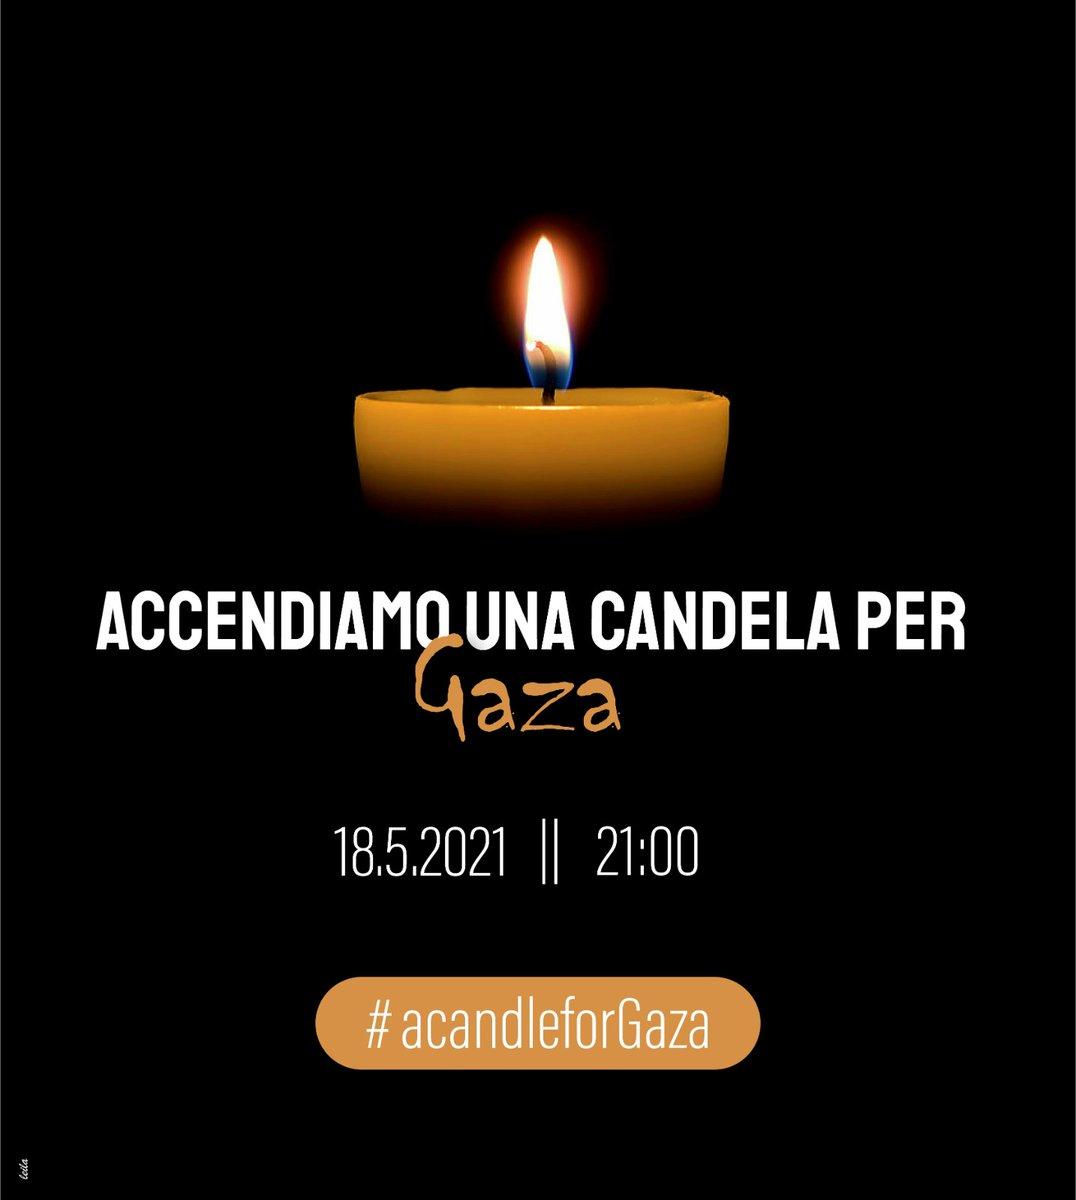 #acandleforGaza